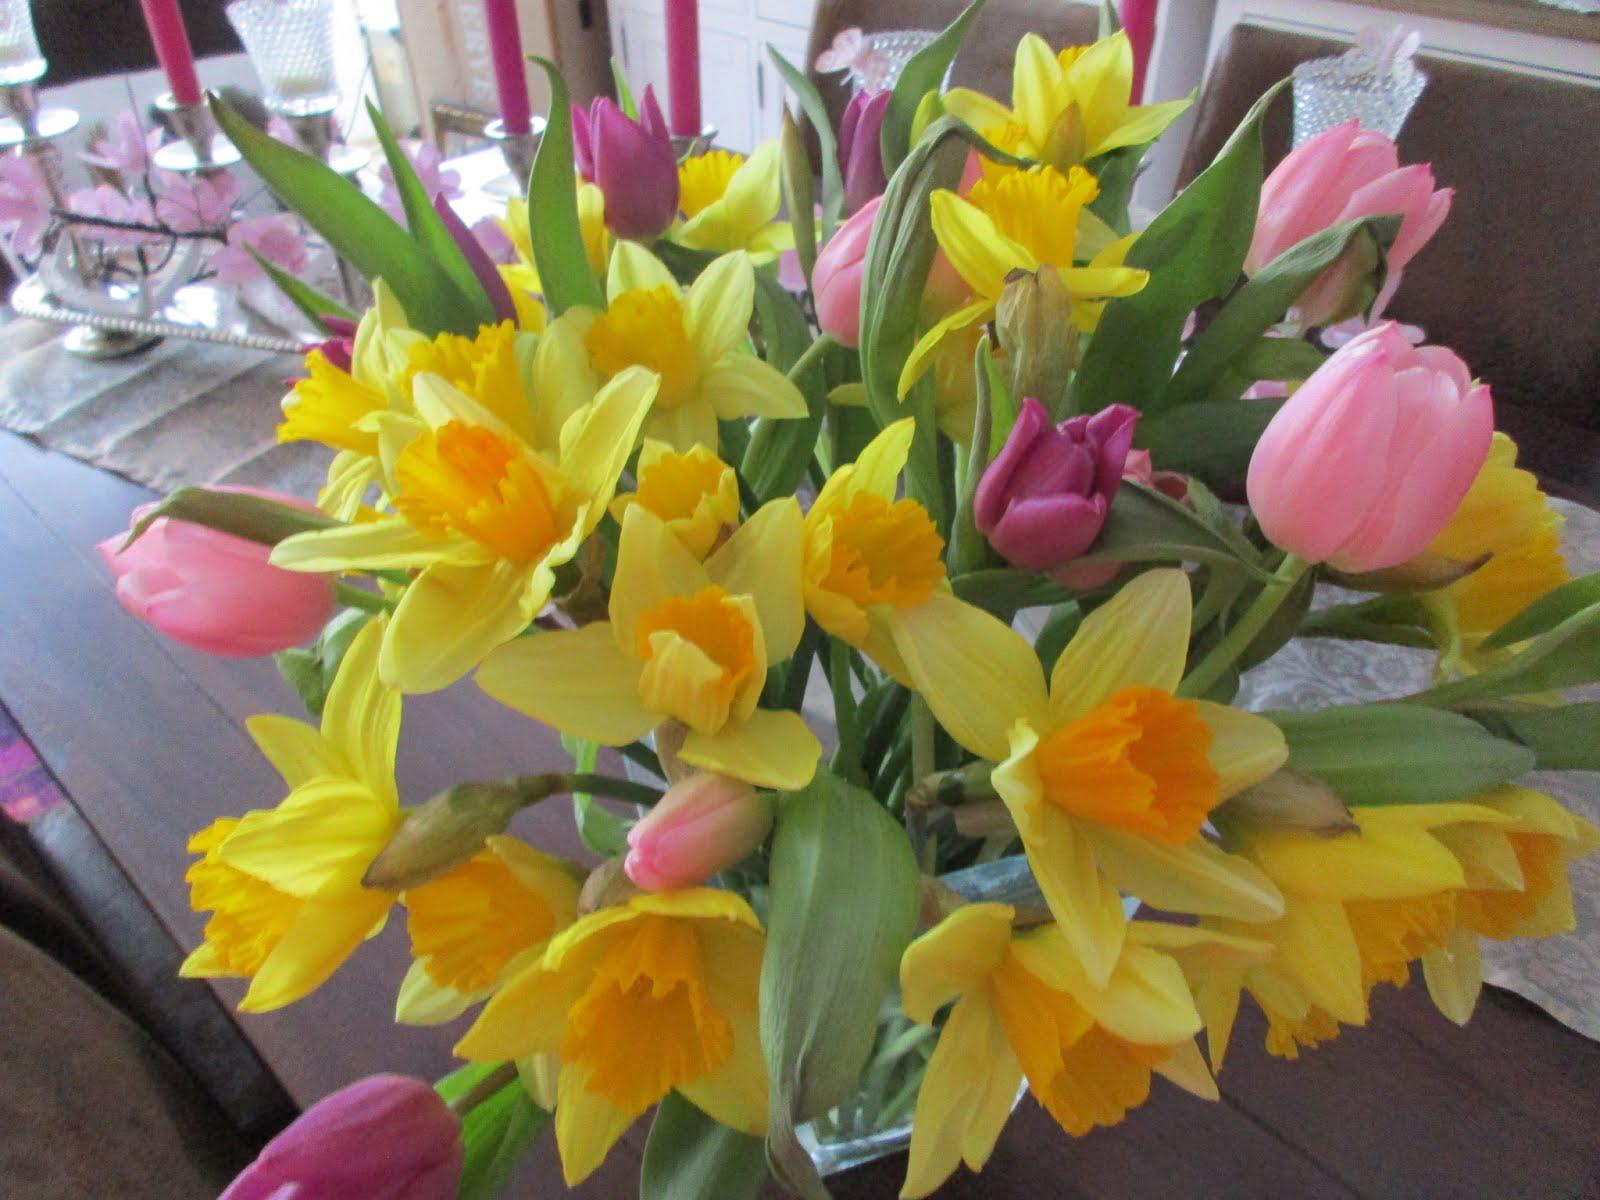 So langsam wird es Frühling...